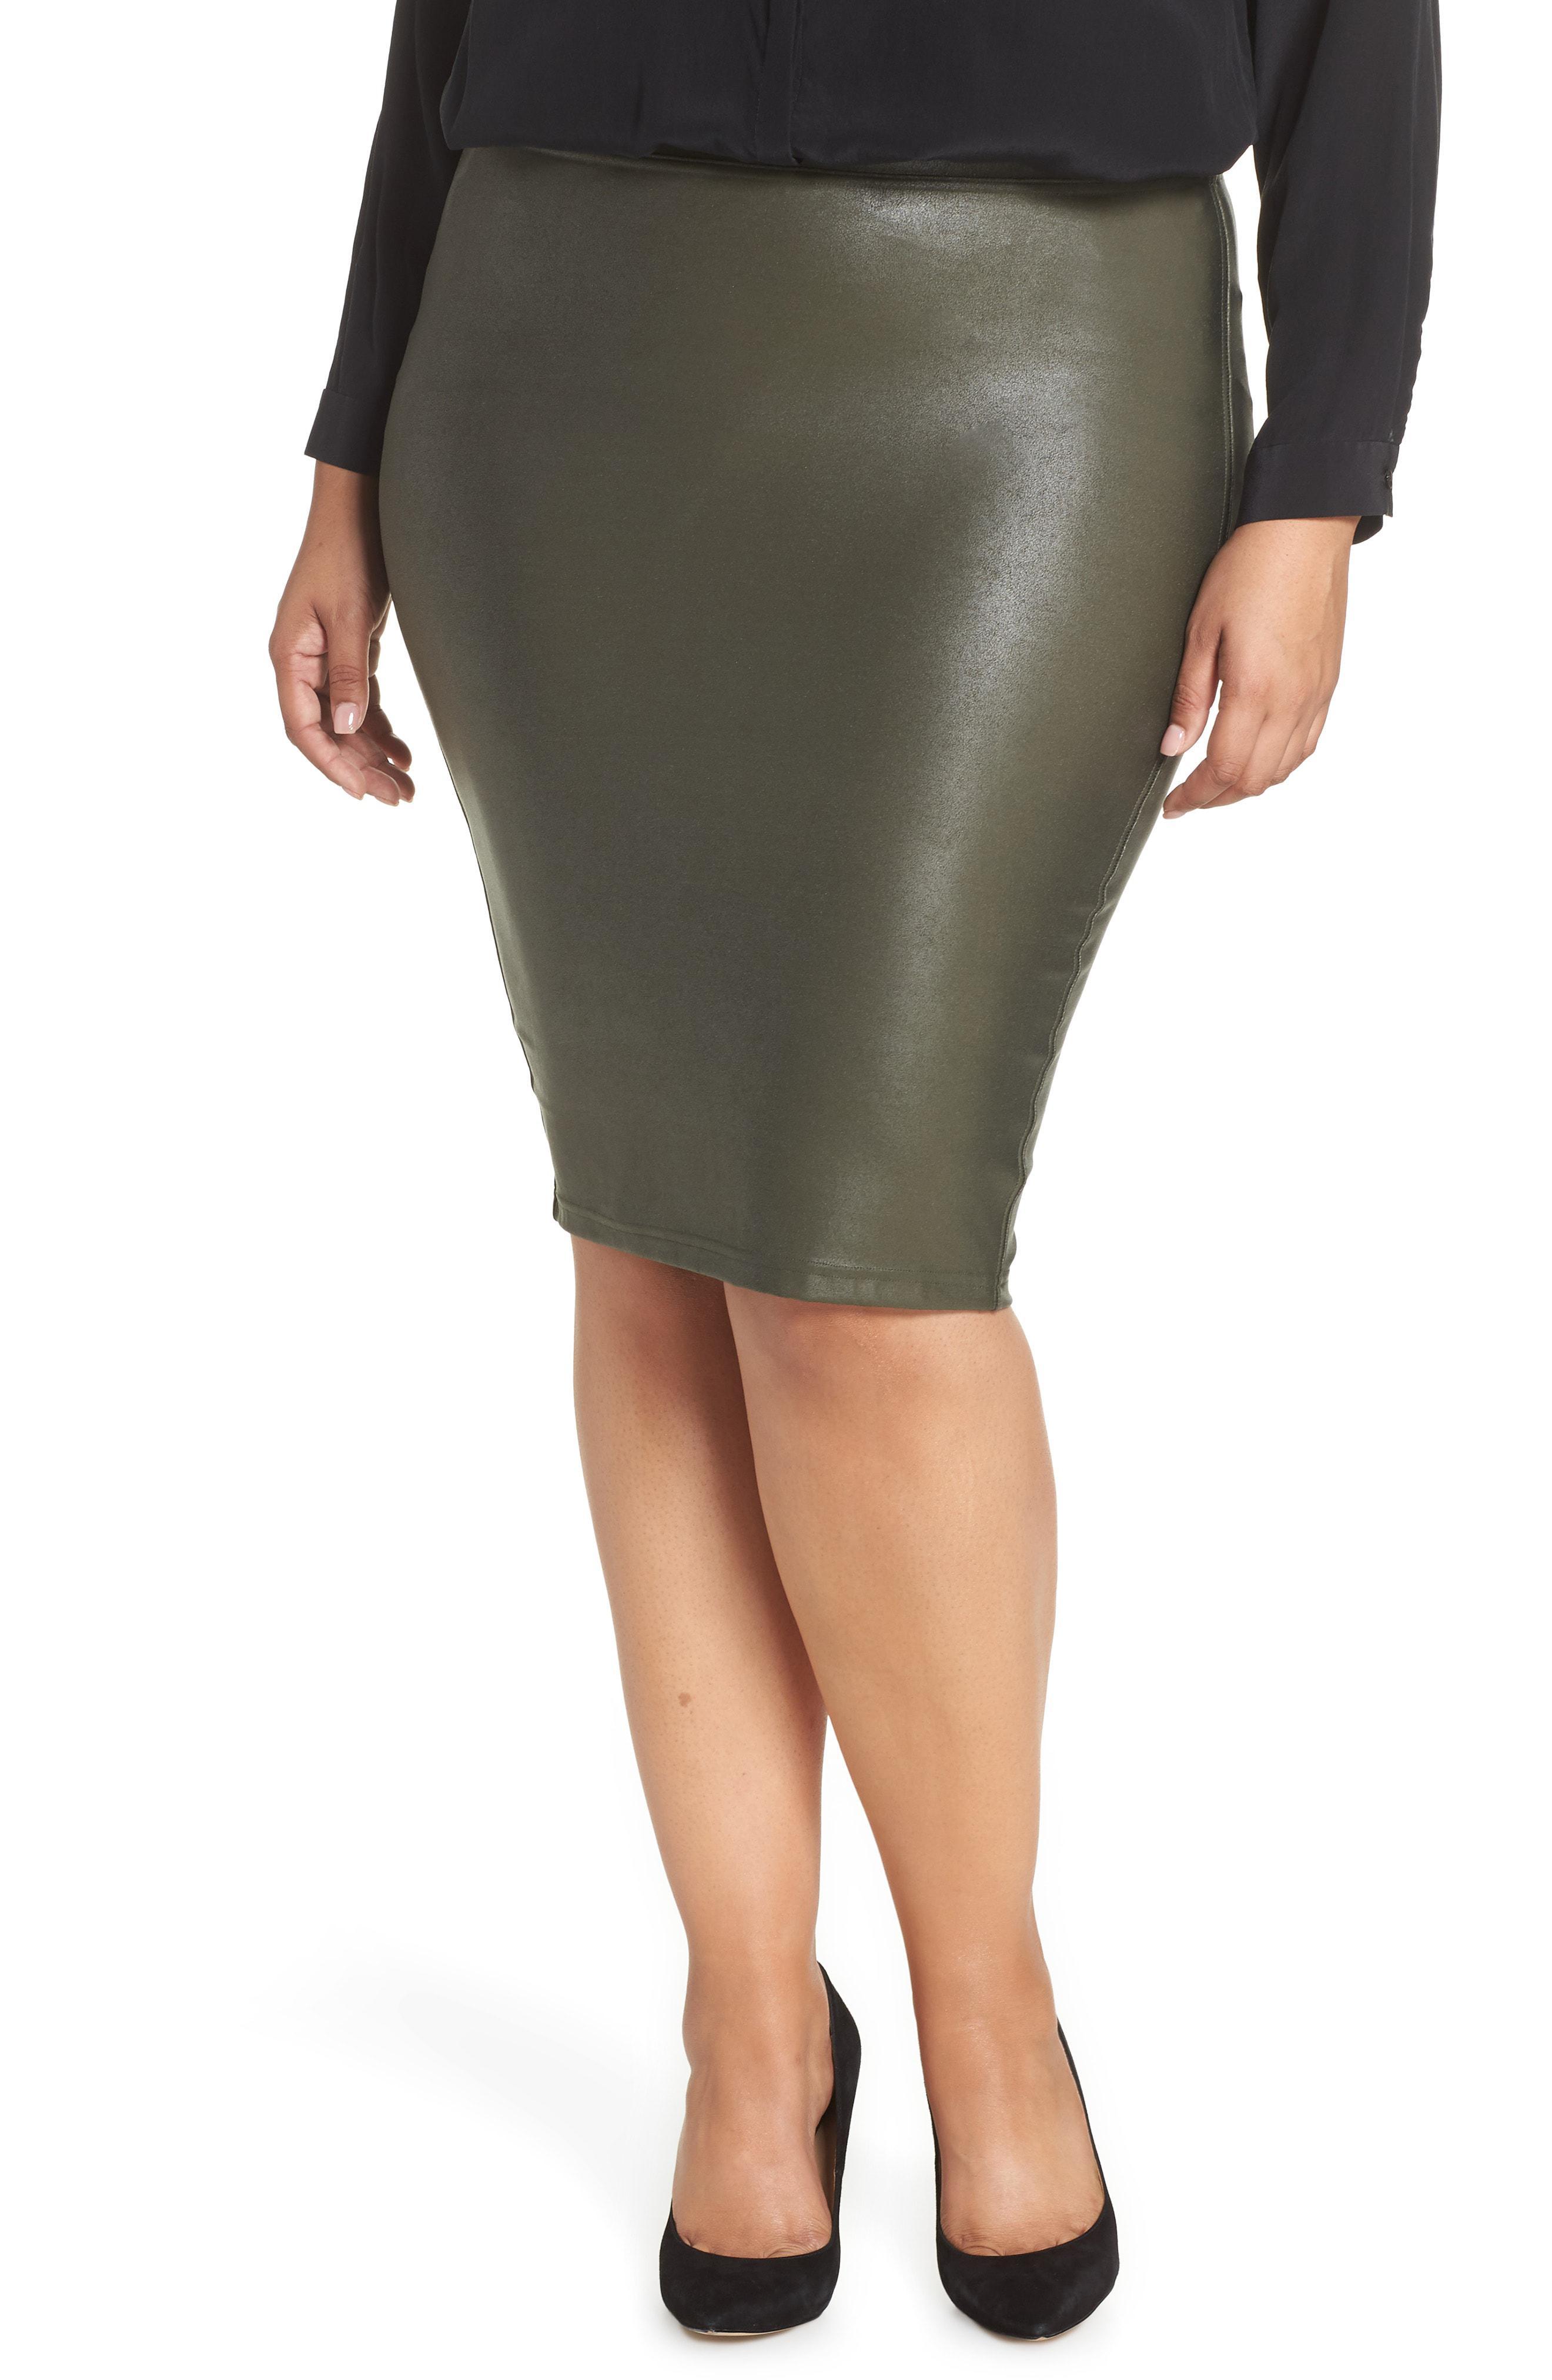 45f8fb7f6 Spanx Spanx Faux Leather Pencil Skirt - Lyst